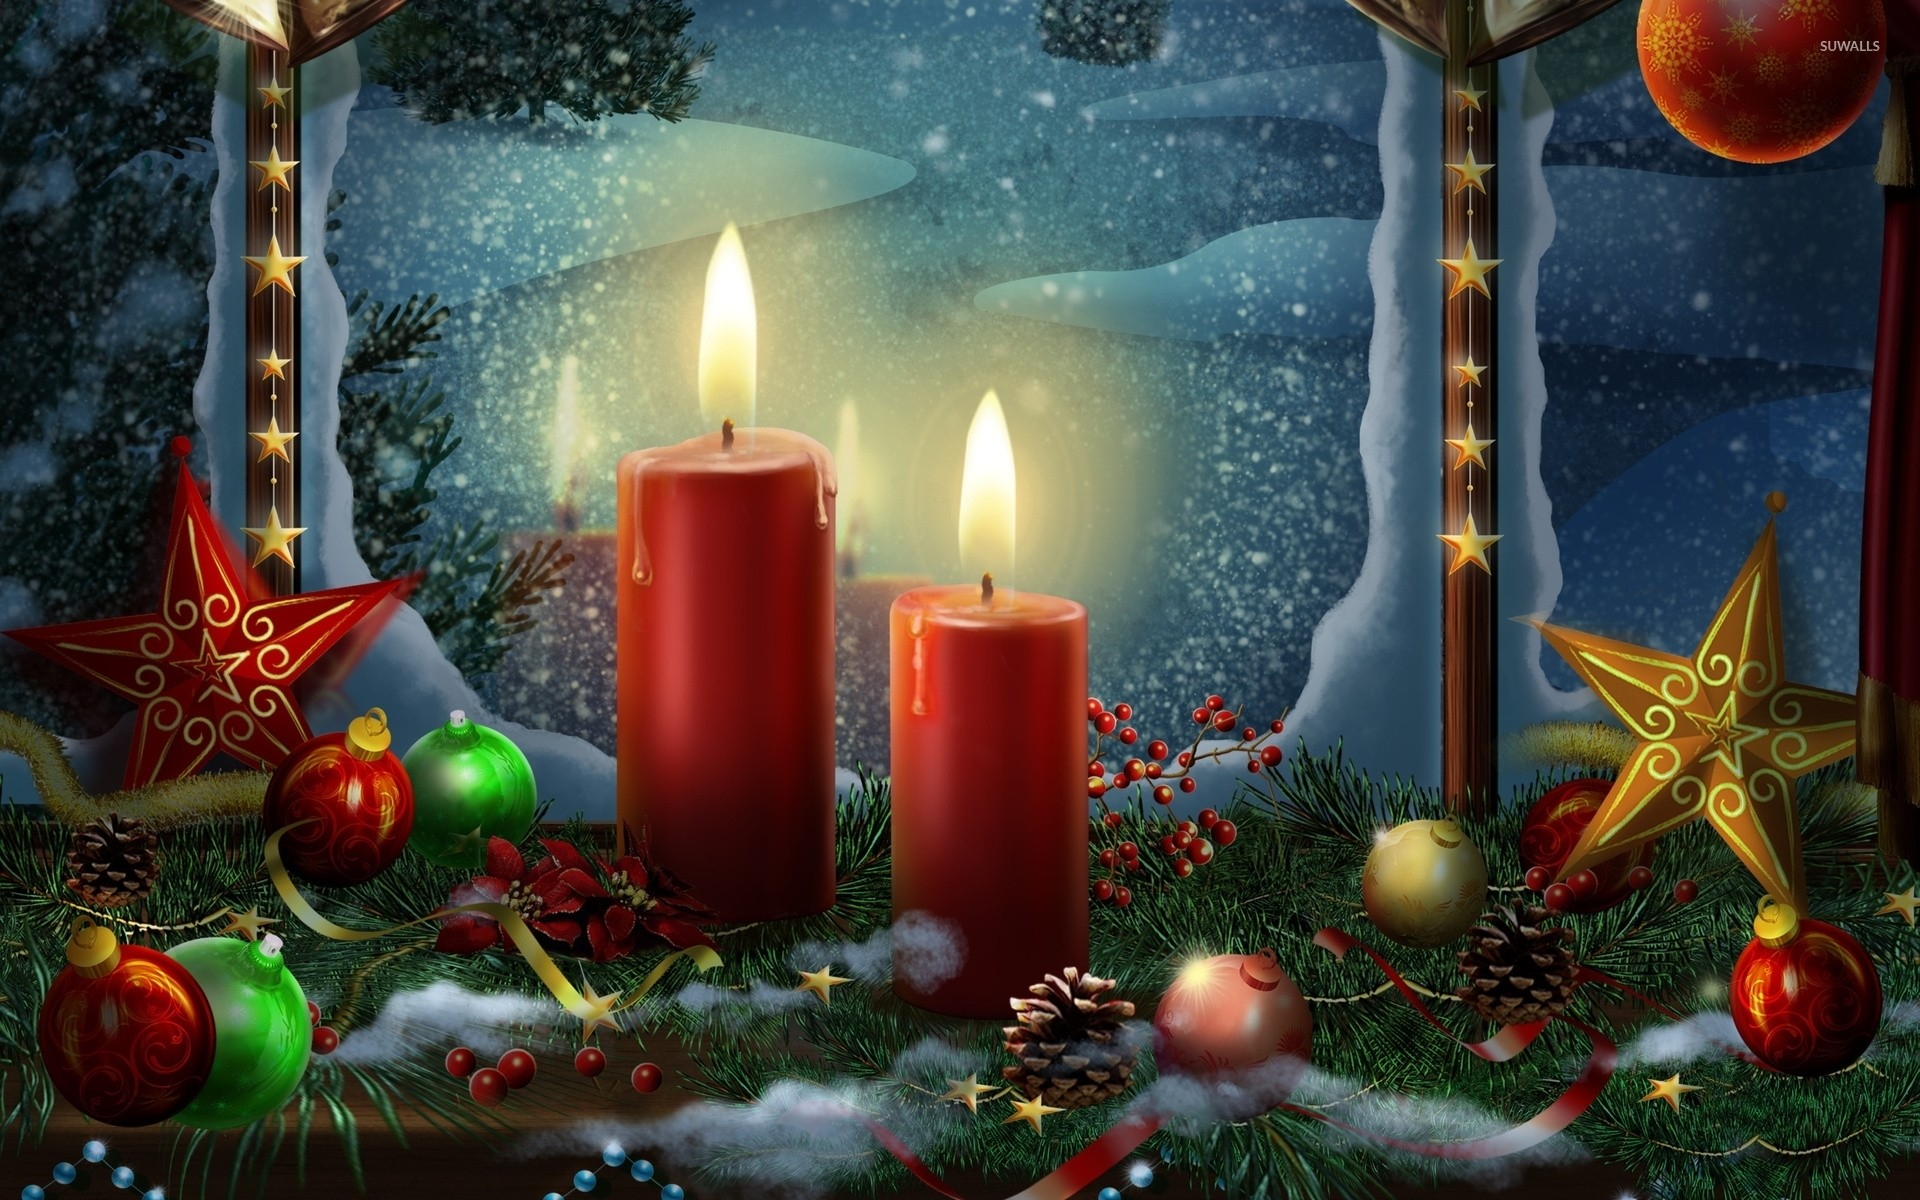 Christmas nativity scene wallpaper download free hd for Decoration wallpaper